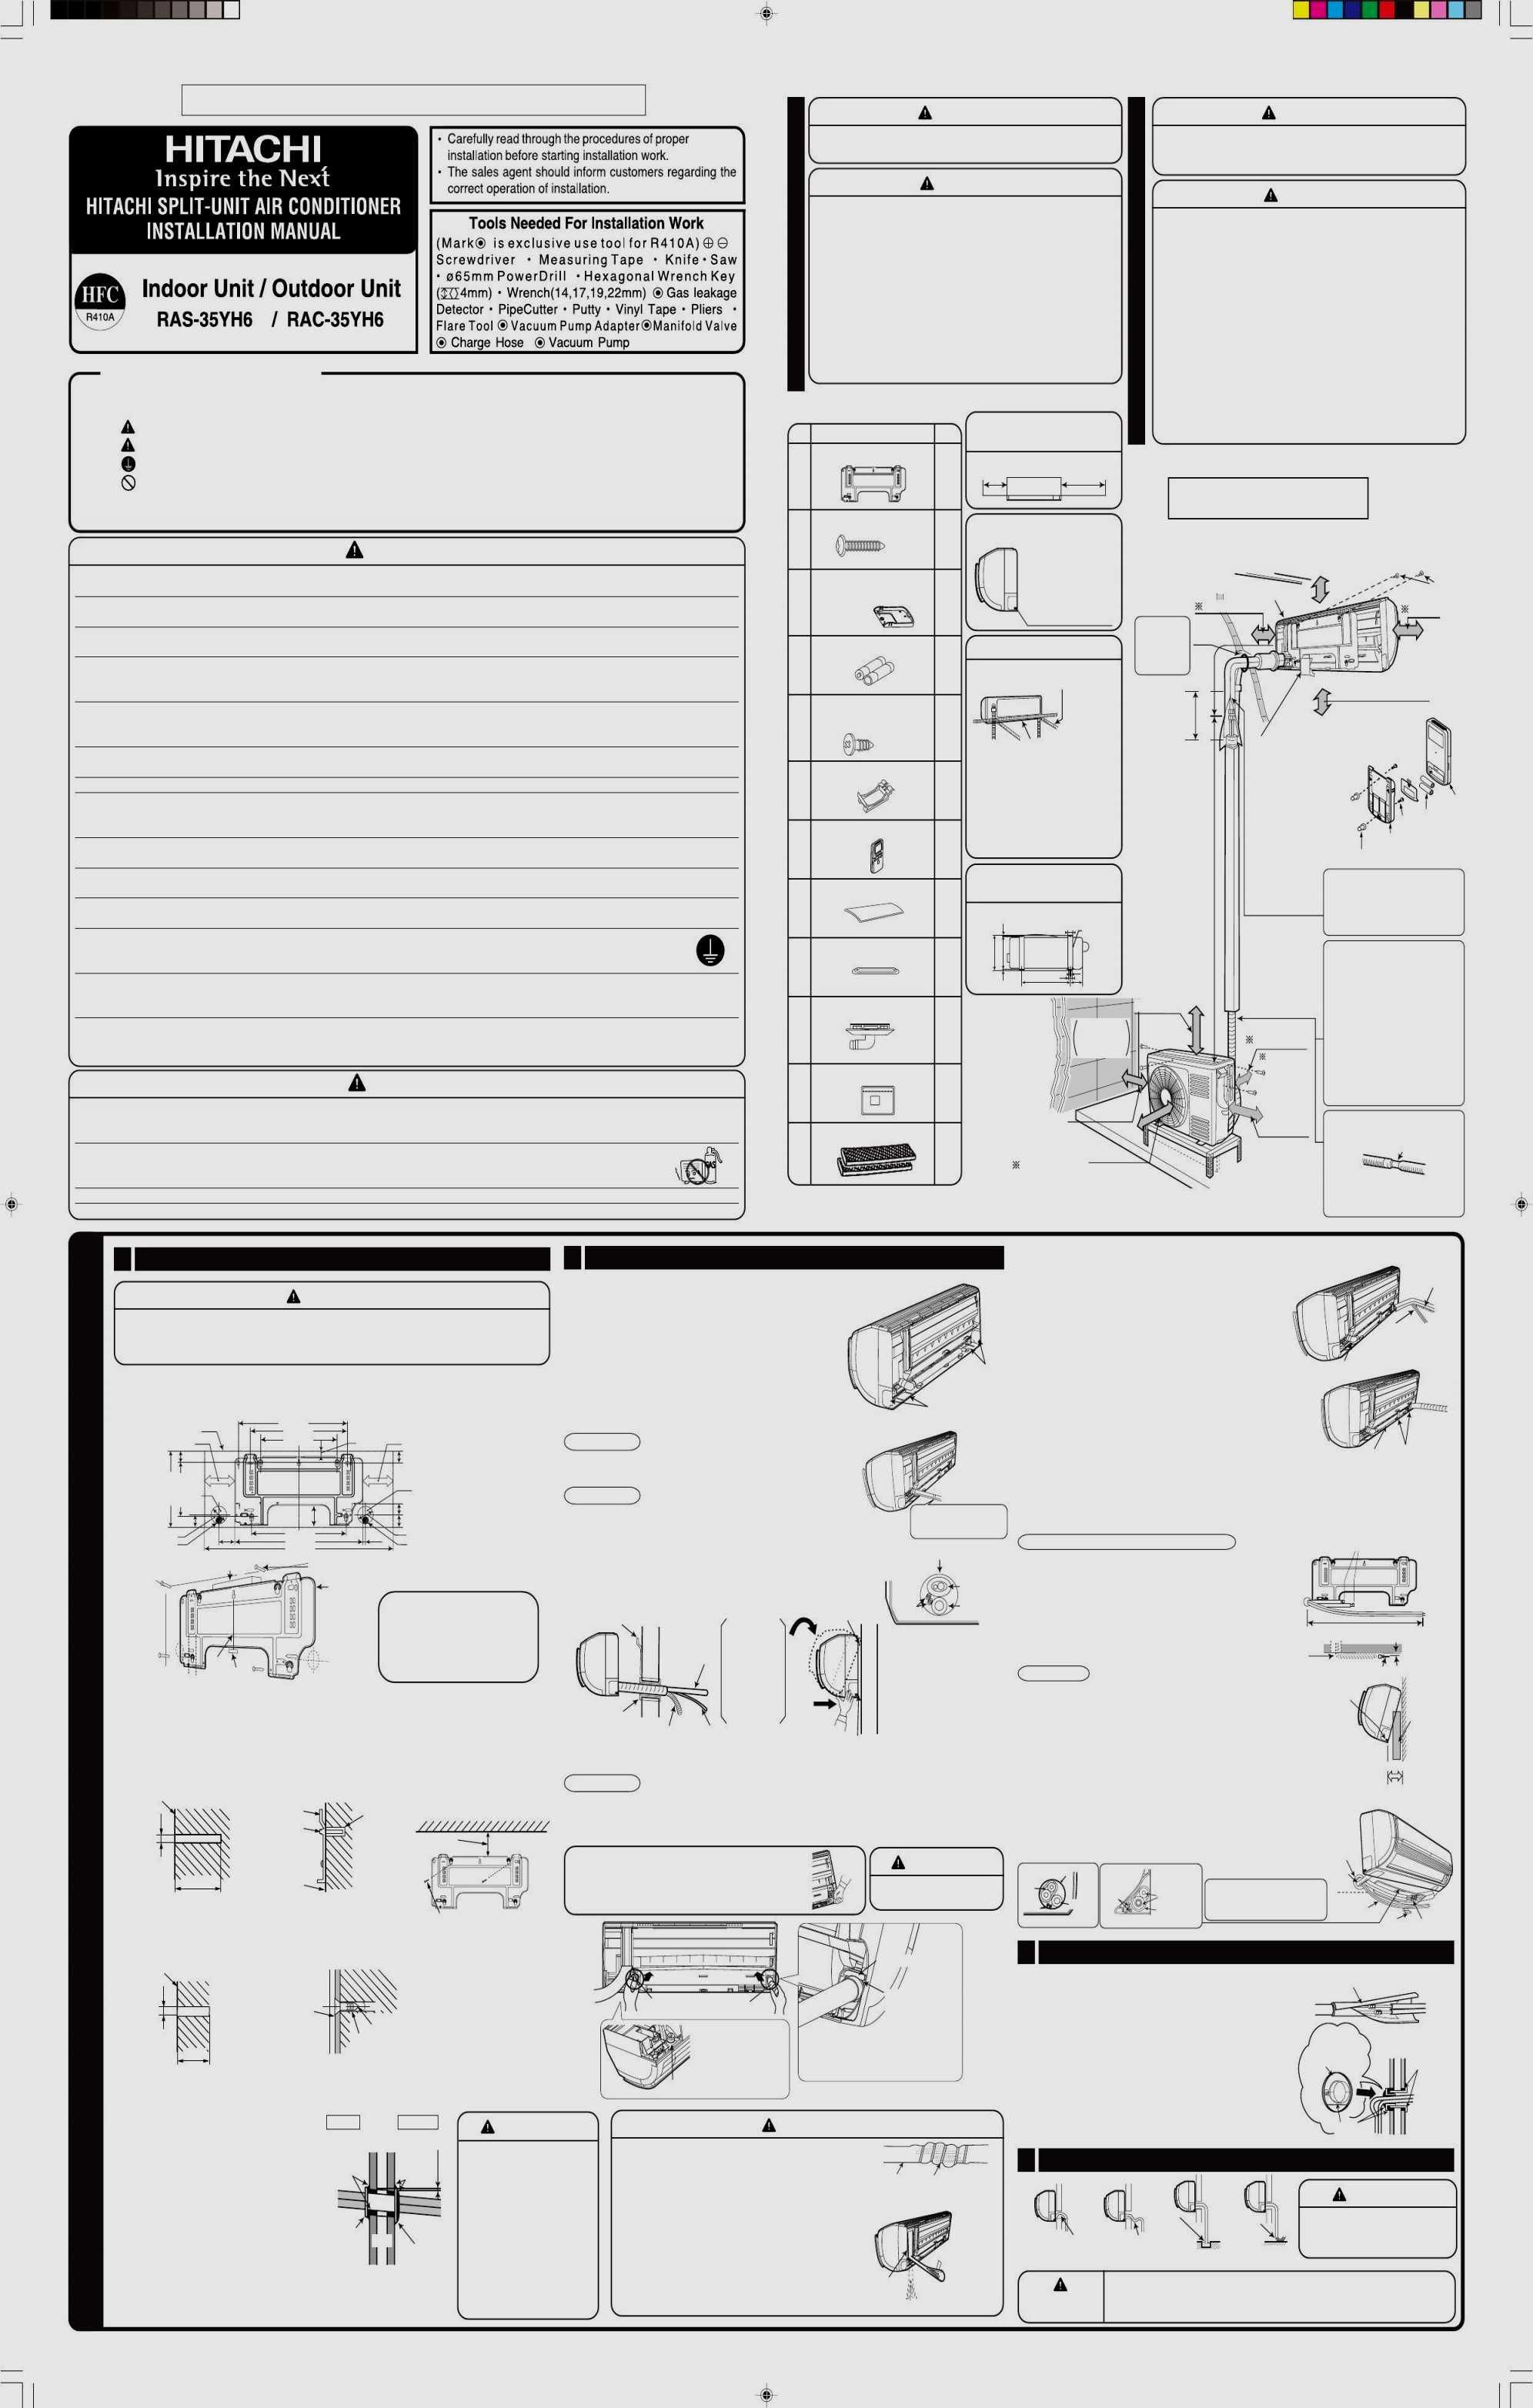 Kicker Cvr 12 Wiring Diagram Likewise Wiring Sub Pro39S And The Like - Kicker Cvr 12 Wiring Diagram